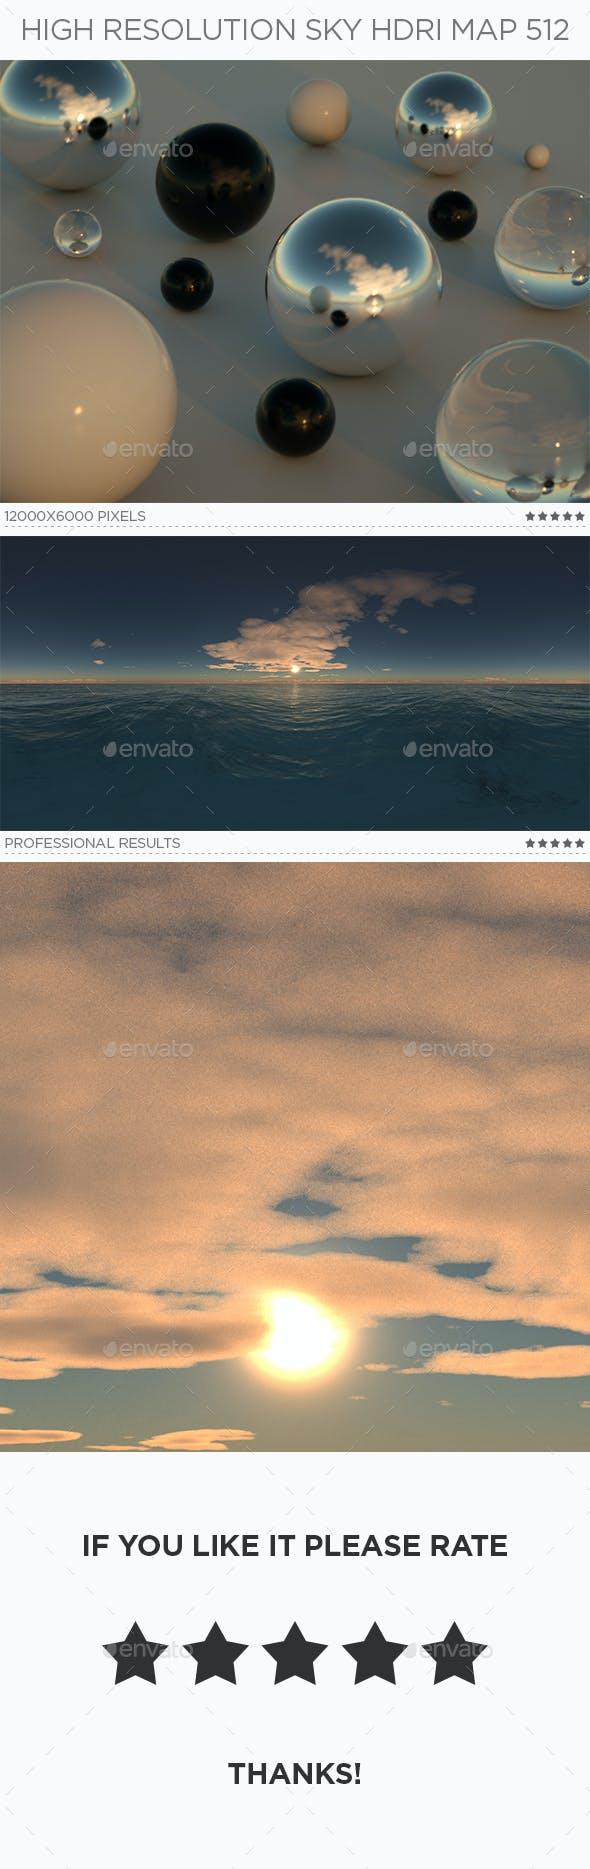 High Resolution Sky HDRi Map 512 - 3DOcean Item for Sale